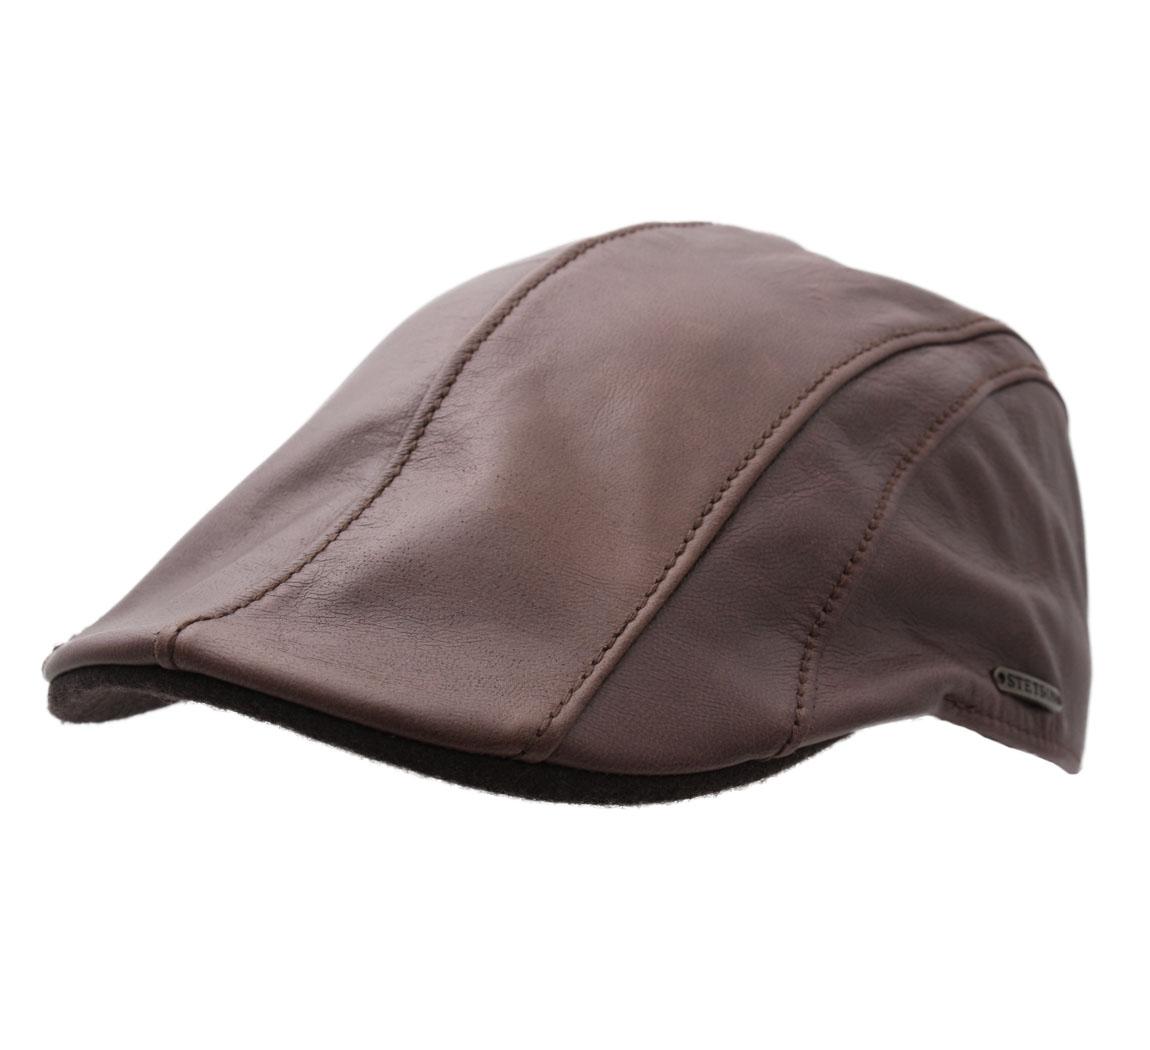 b ret casquette plate cuir homme ou femme manatee goatskin ebay. Black Bedroom Furniture Sets. Home Design Ideas